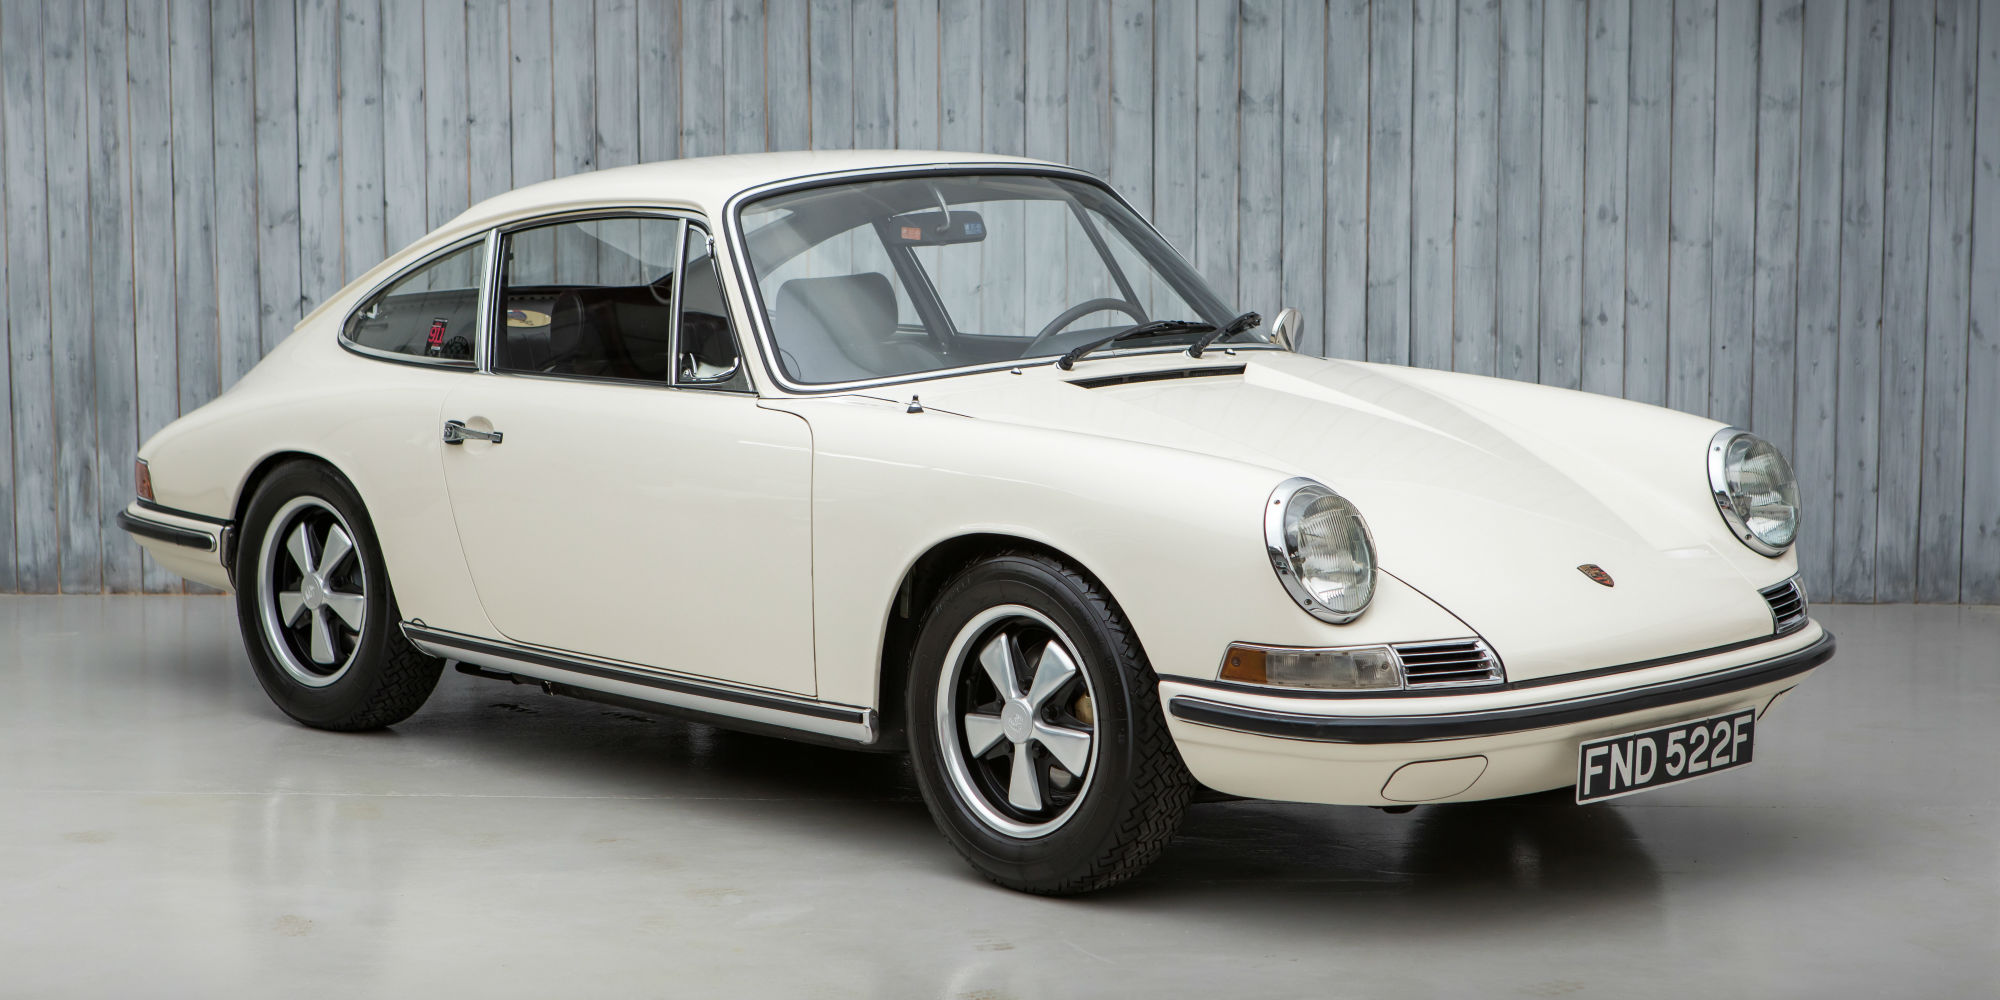 1968 Porsche 911S 2.0 SWB For Sale   William I'Anson Ltd